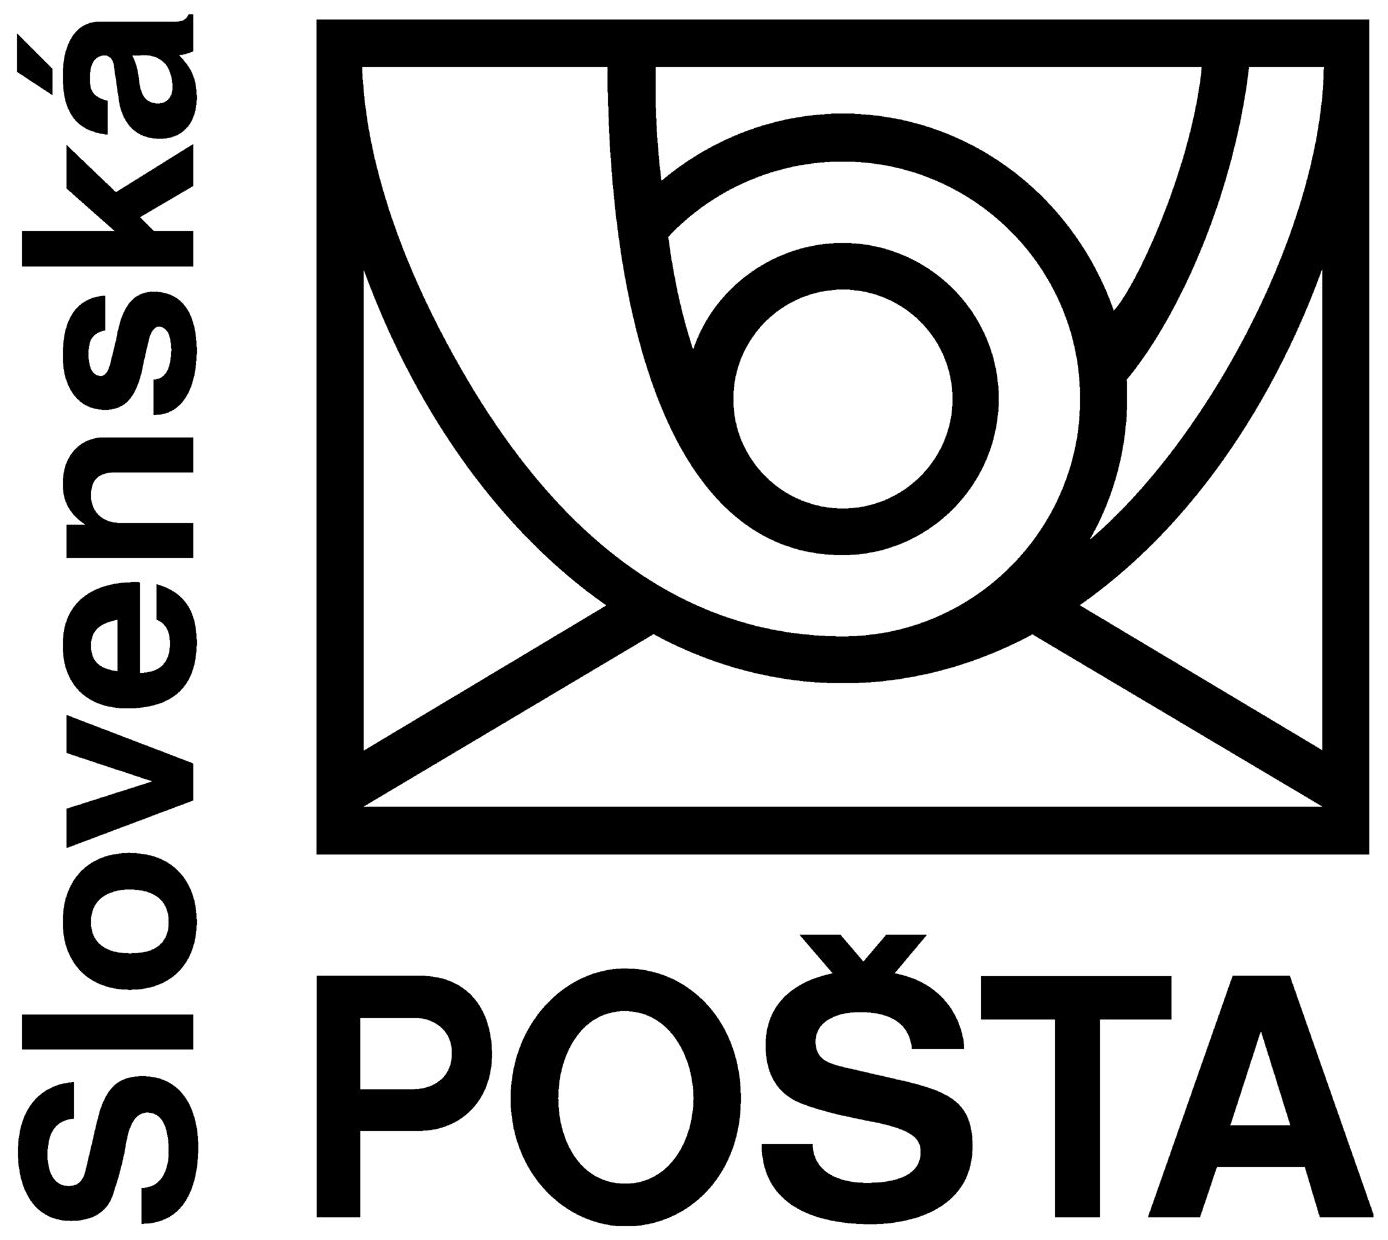 Slovensk pota - Pean sluby